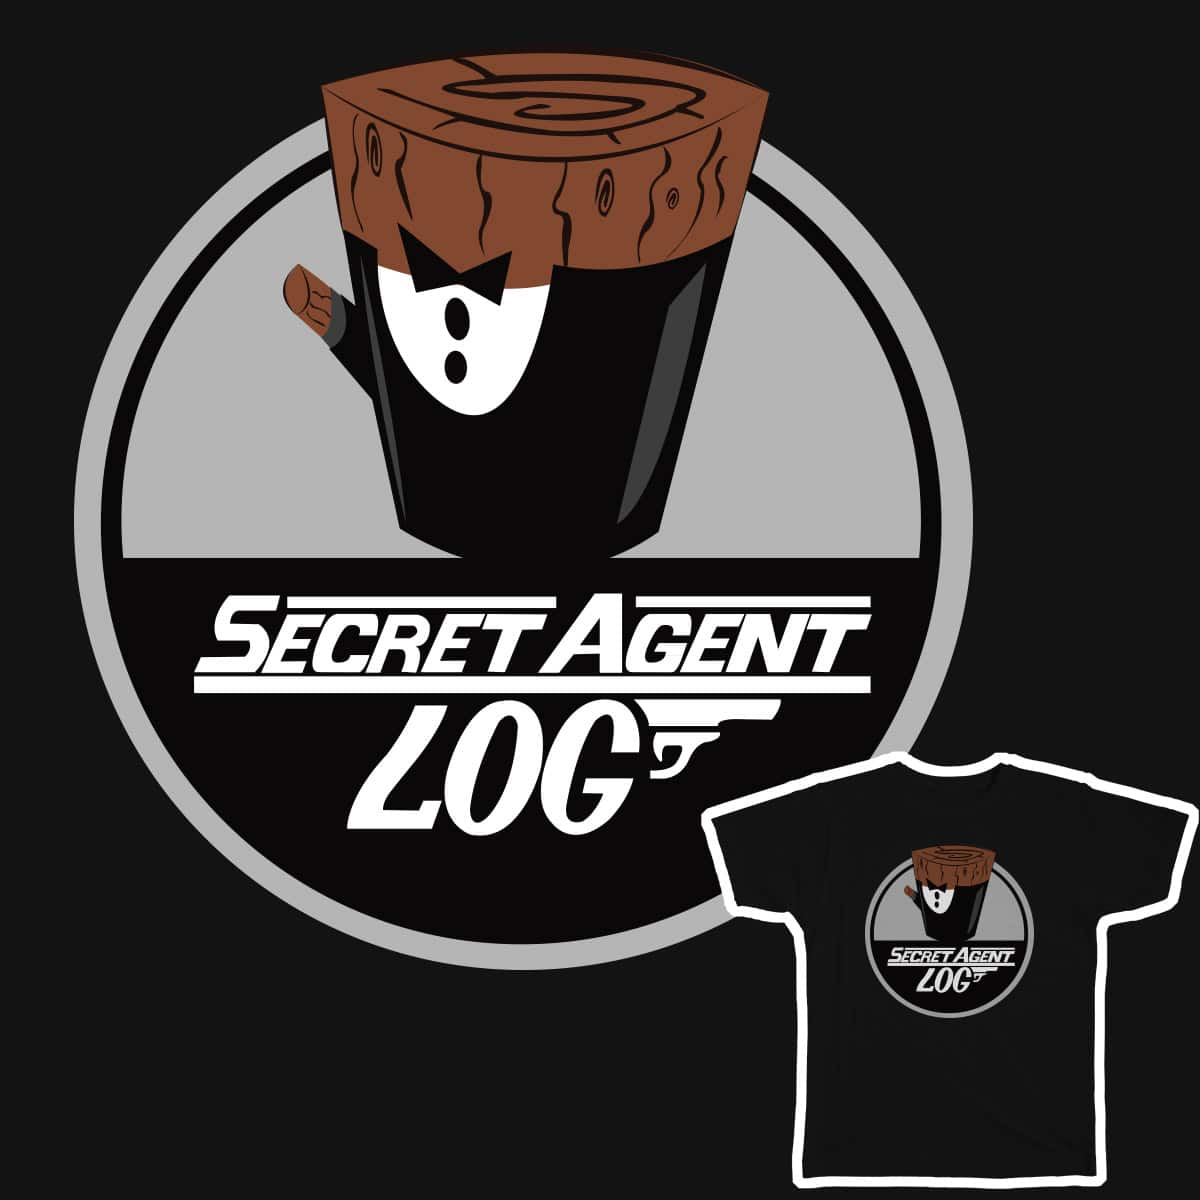 Secret Agent Log! by khodabae on Threadless